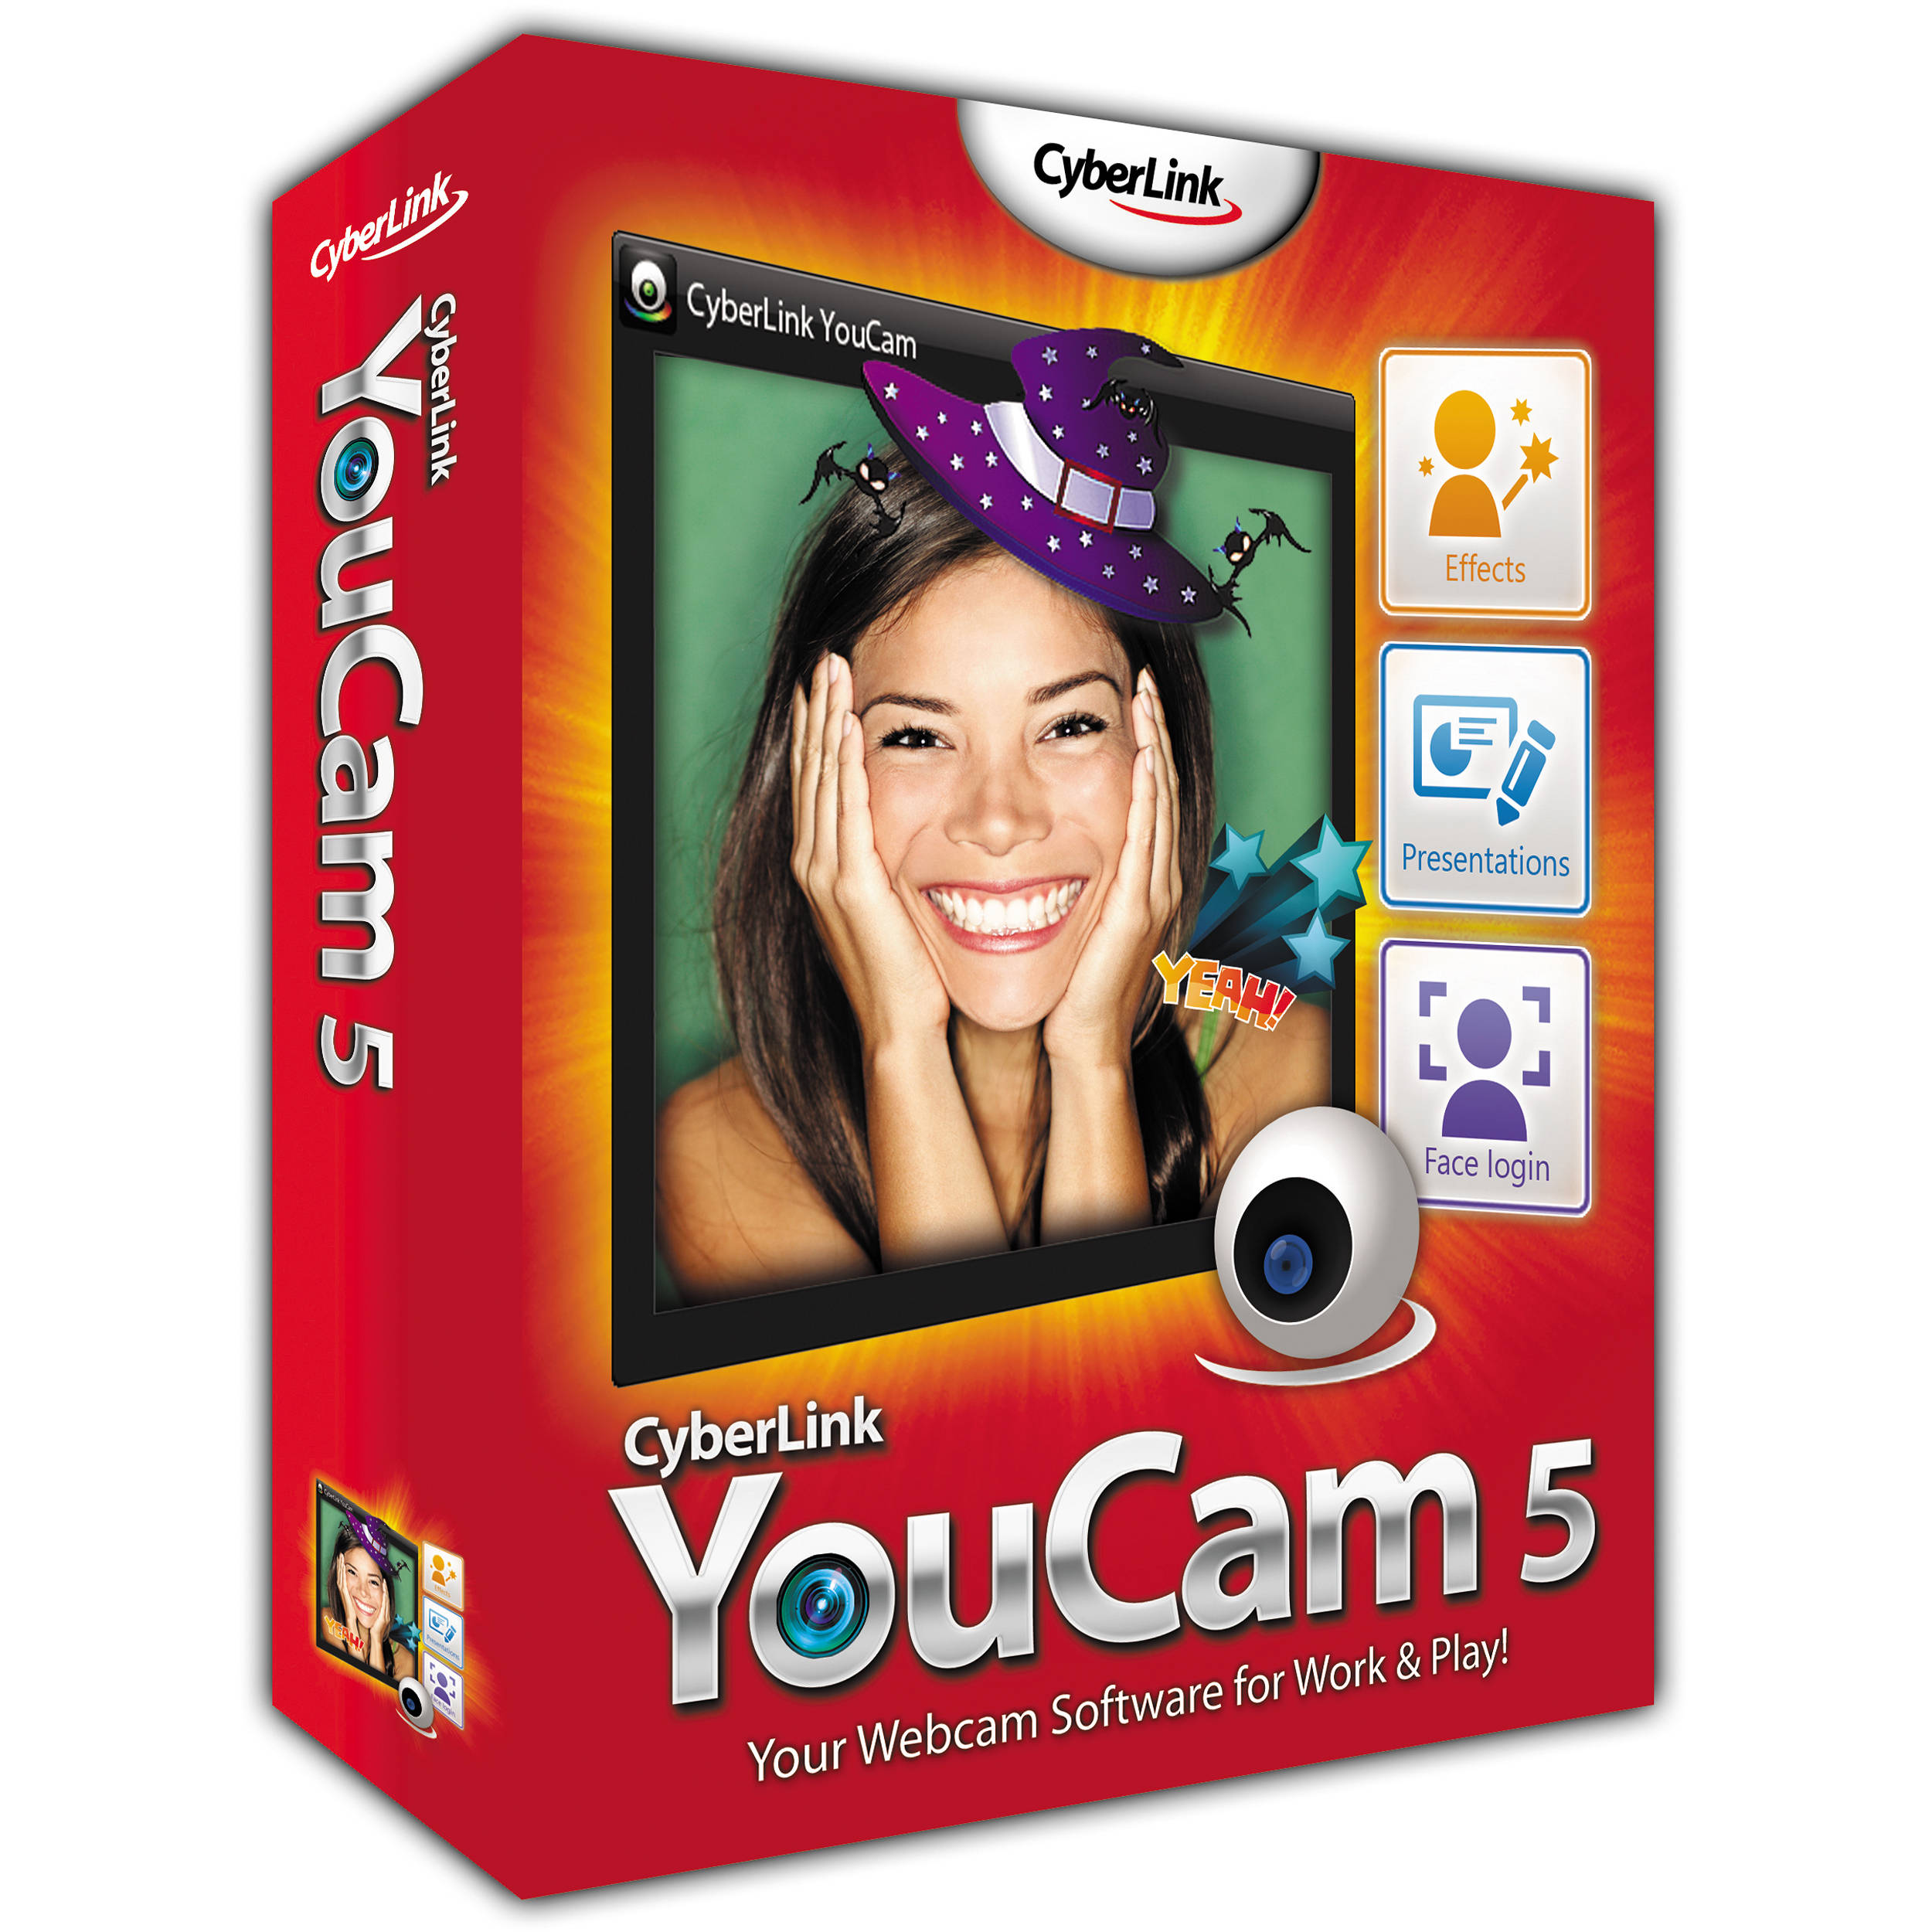 cyberlink youcam 5